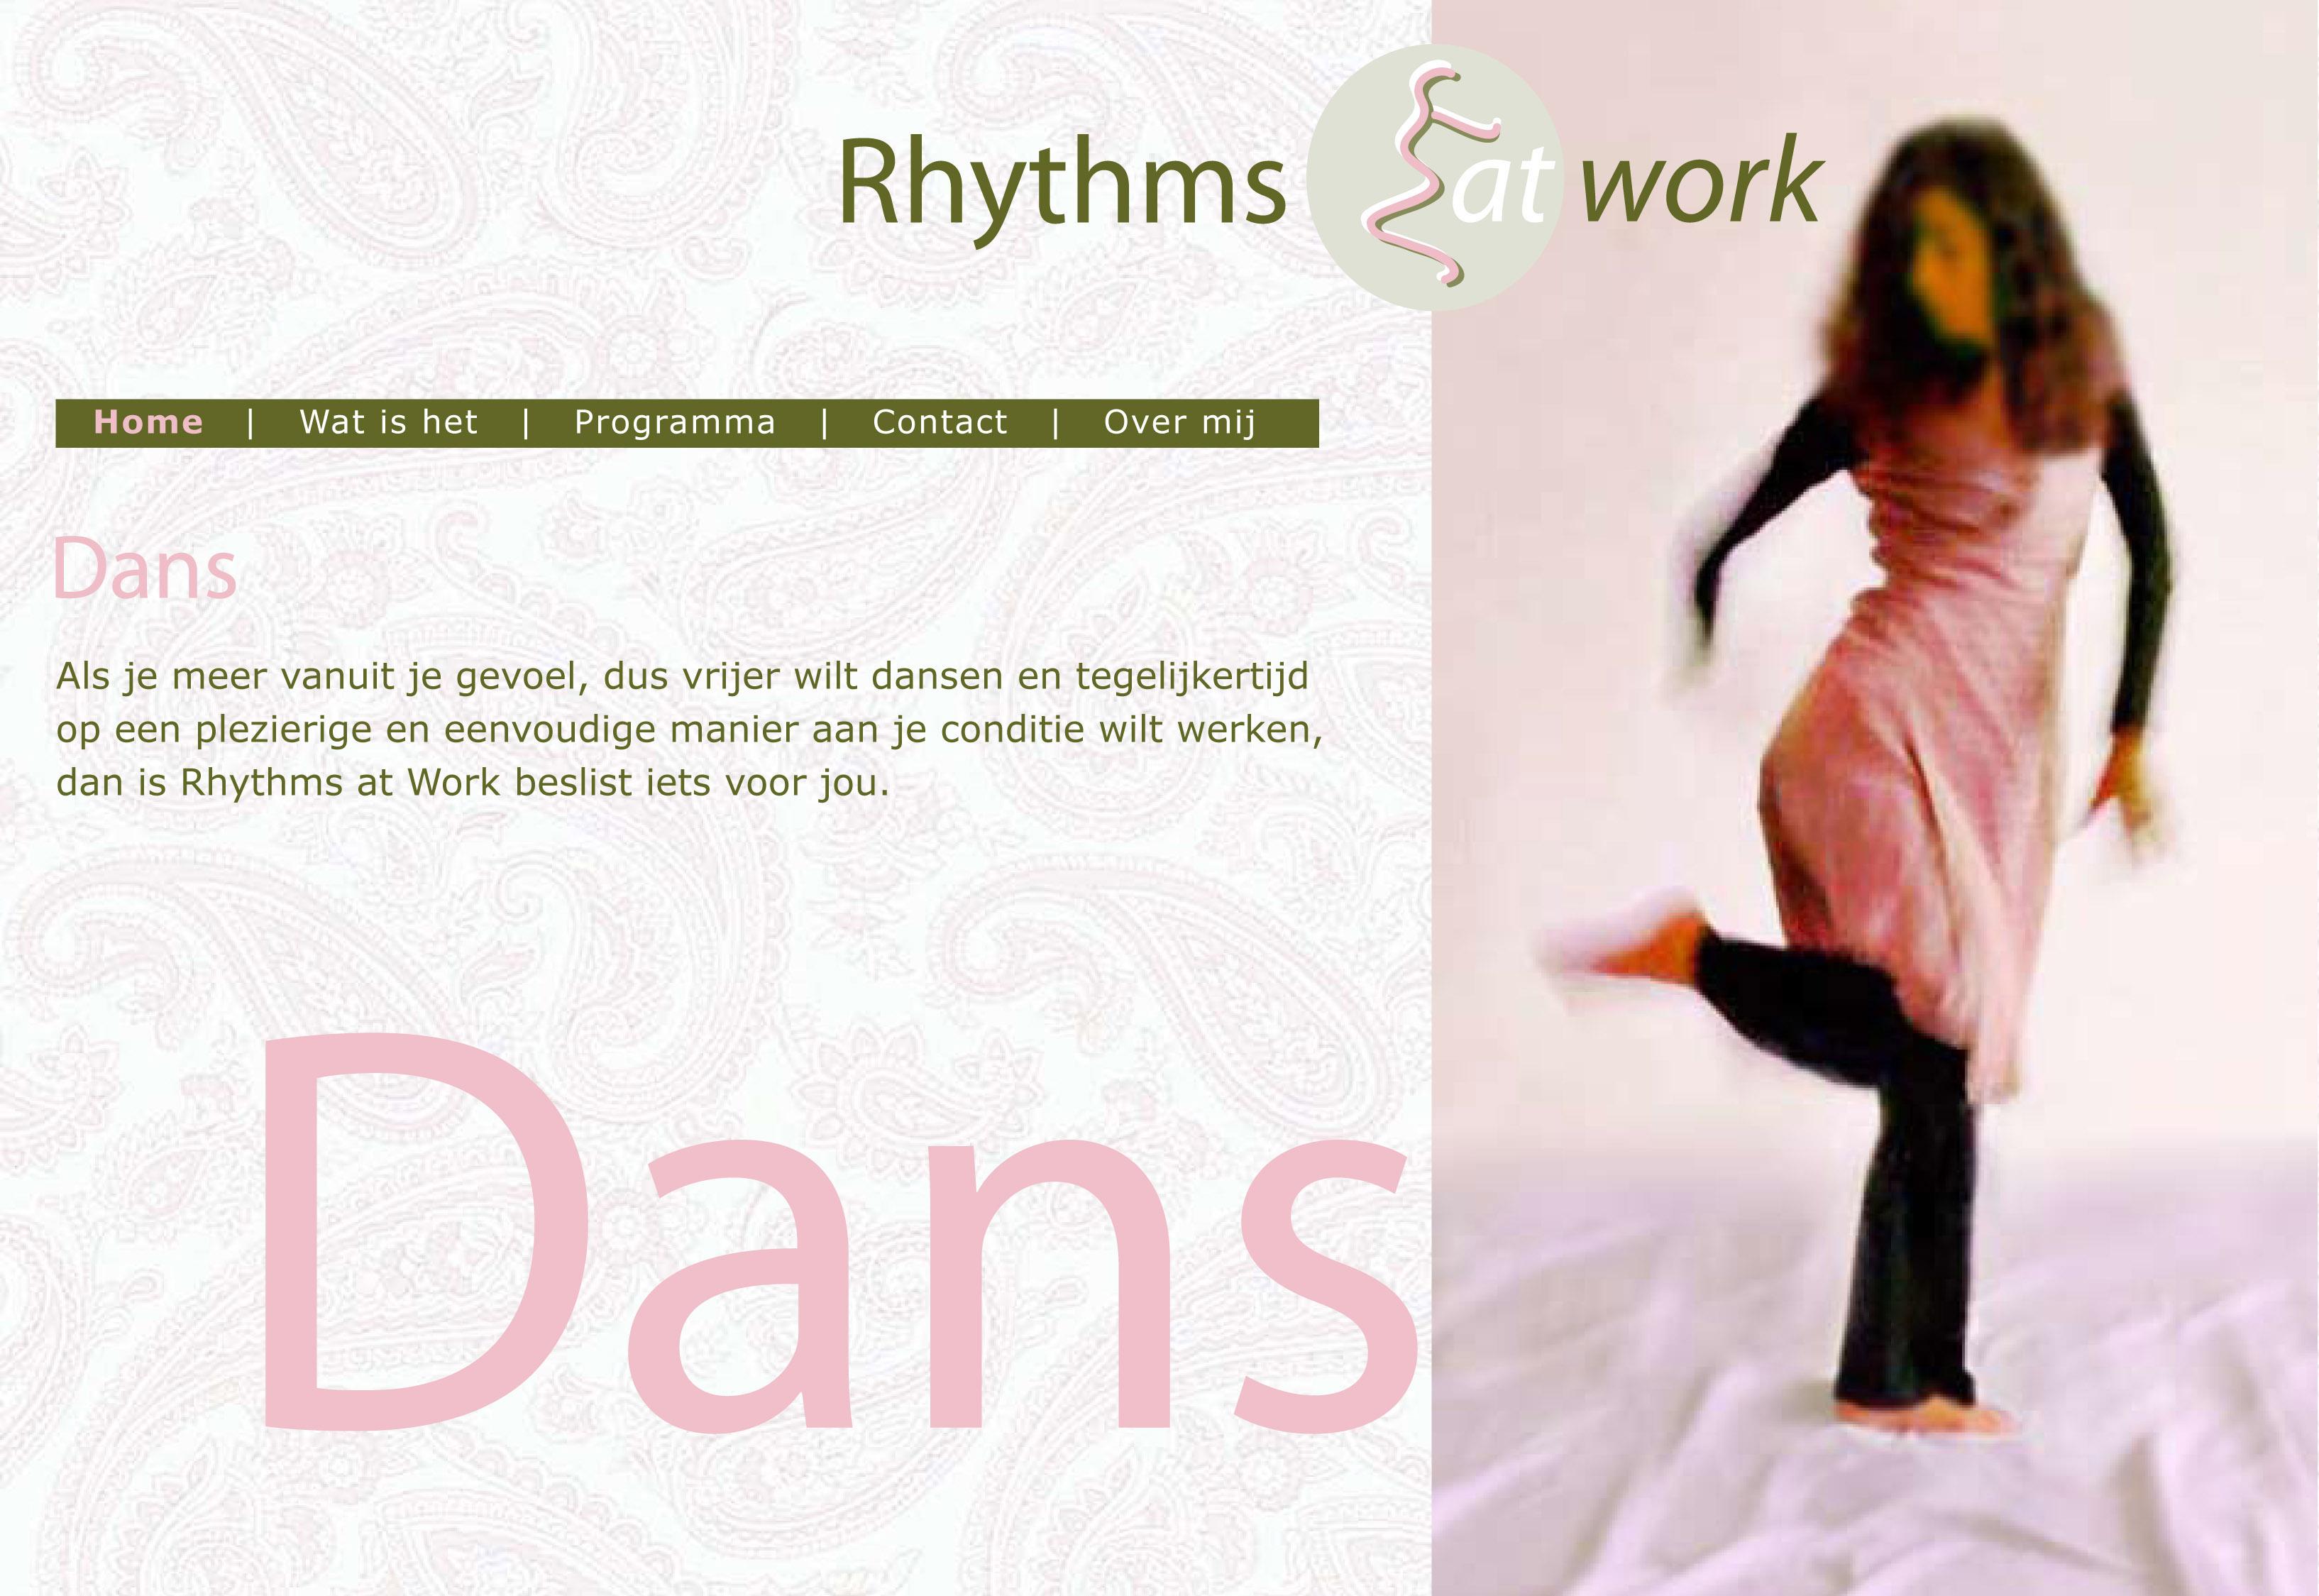 xA 1home-Rhythms at work website